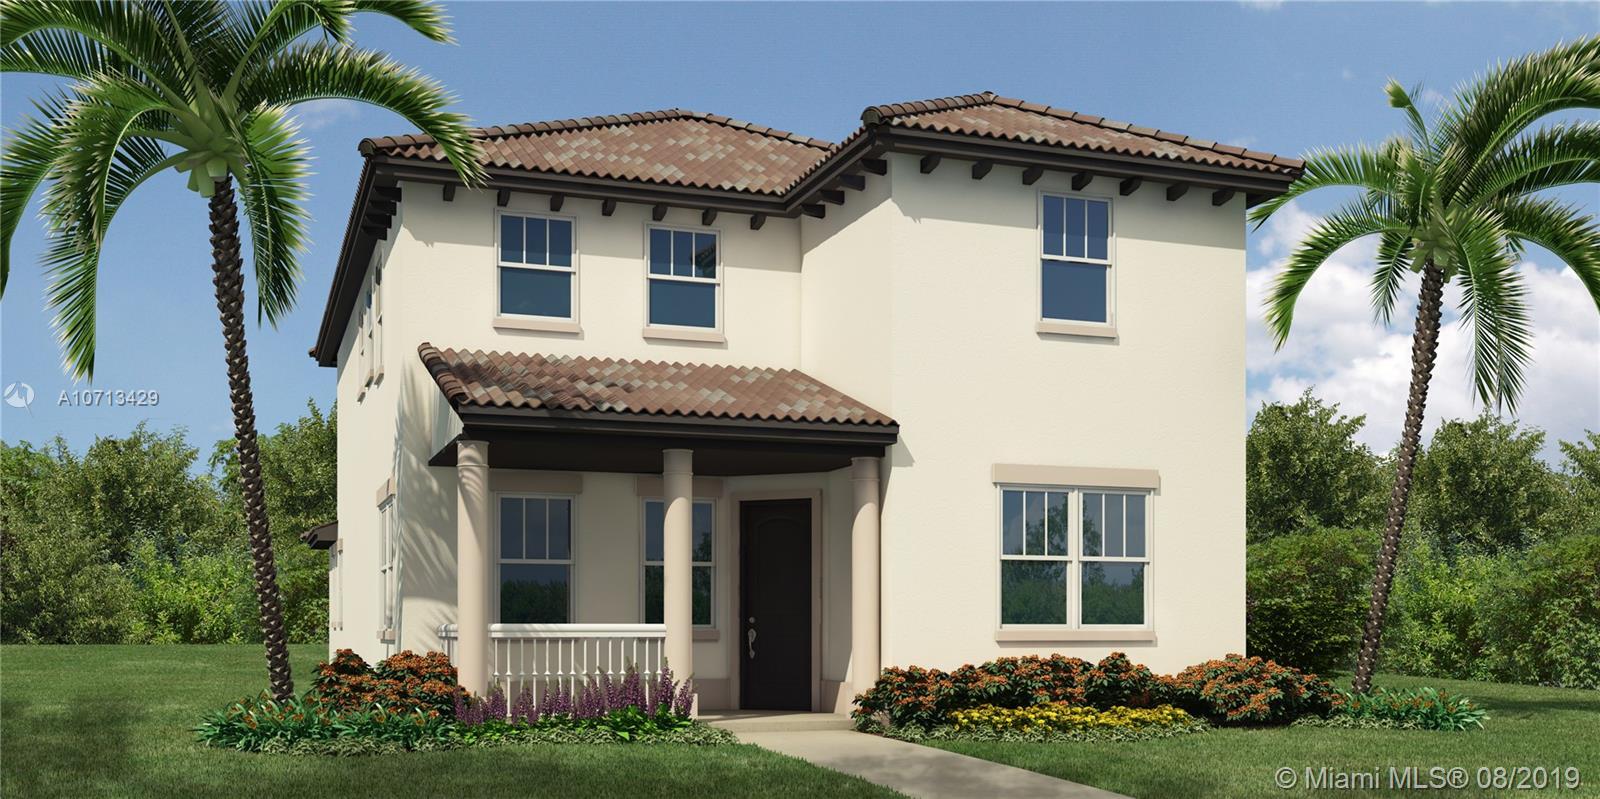 24462 SW 117th Path, Homestead, FL 33032 - Homestead, FL real estate listing